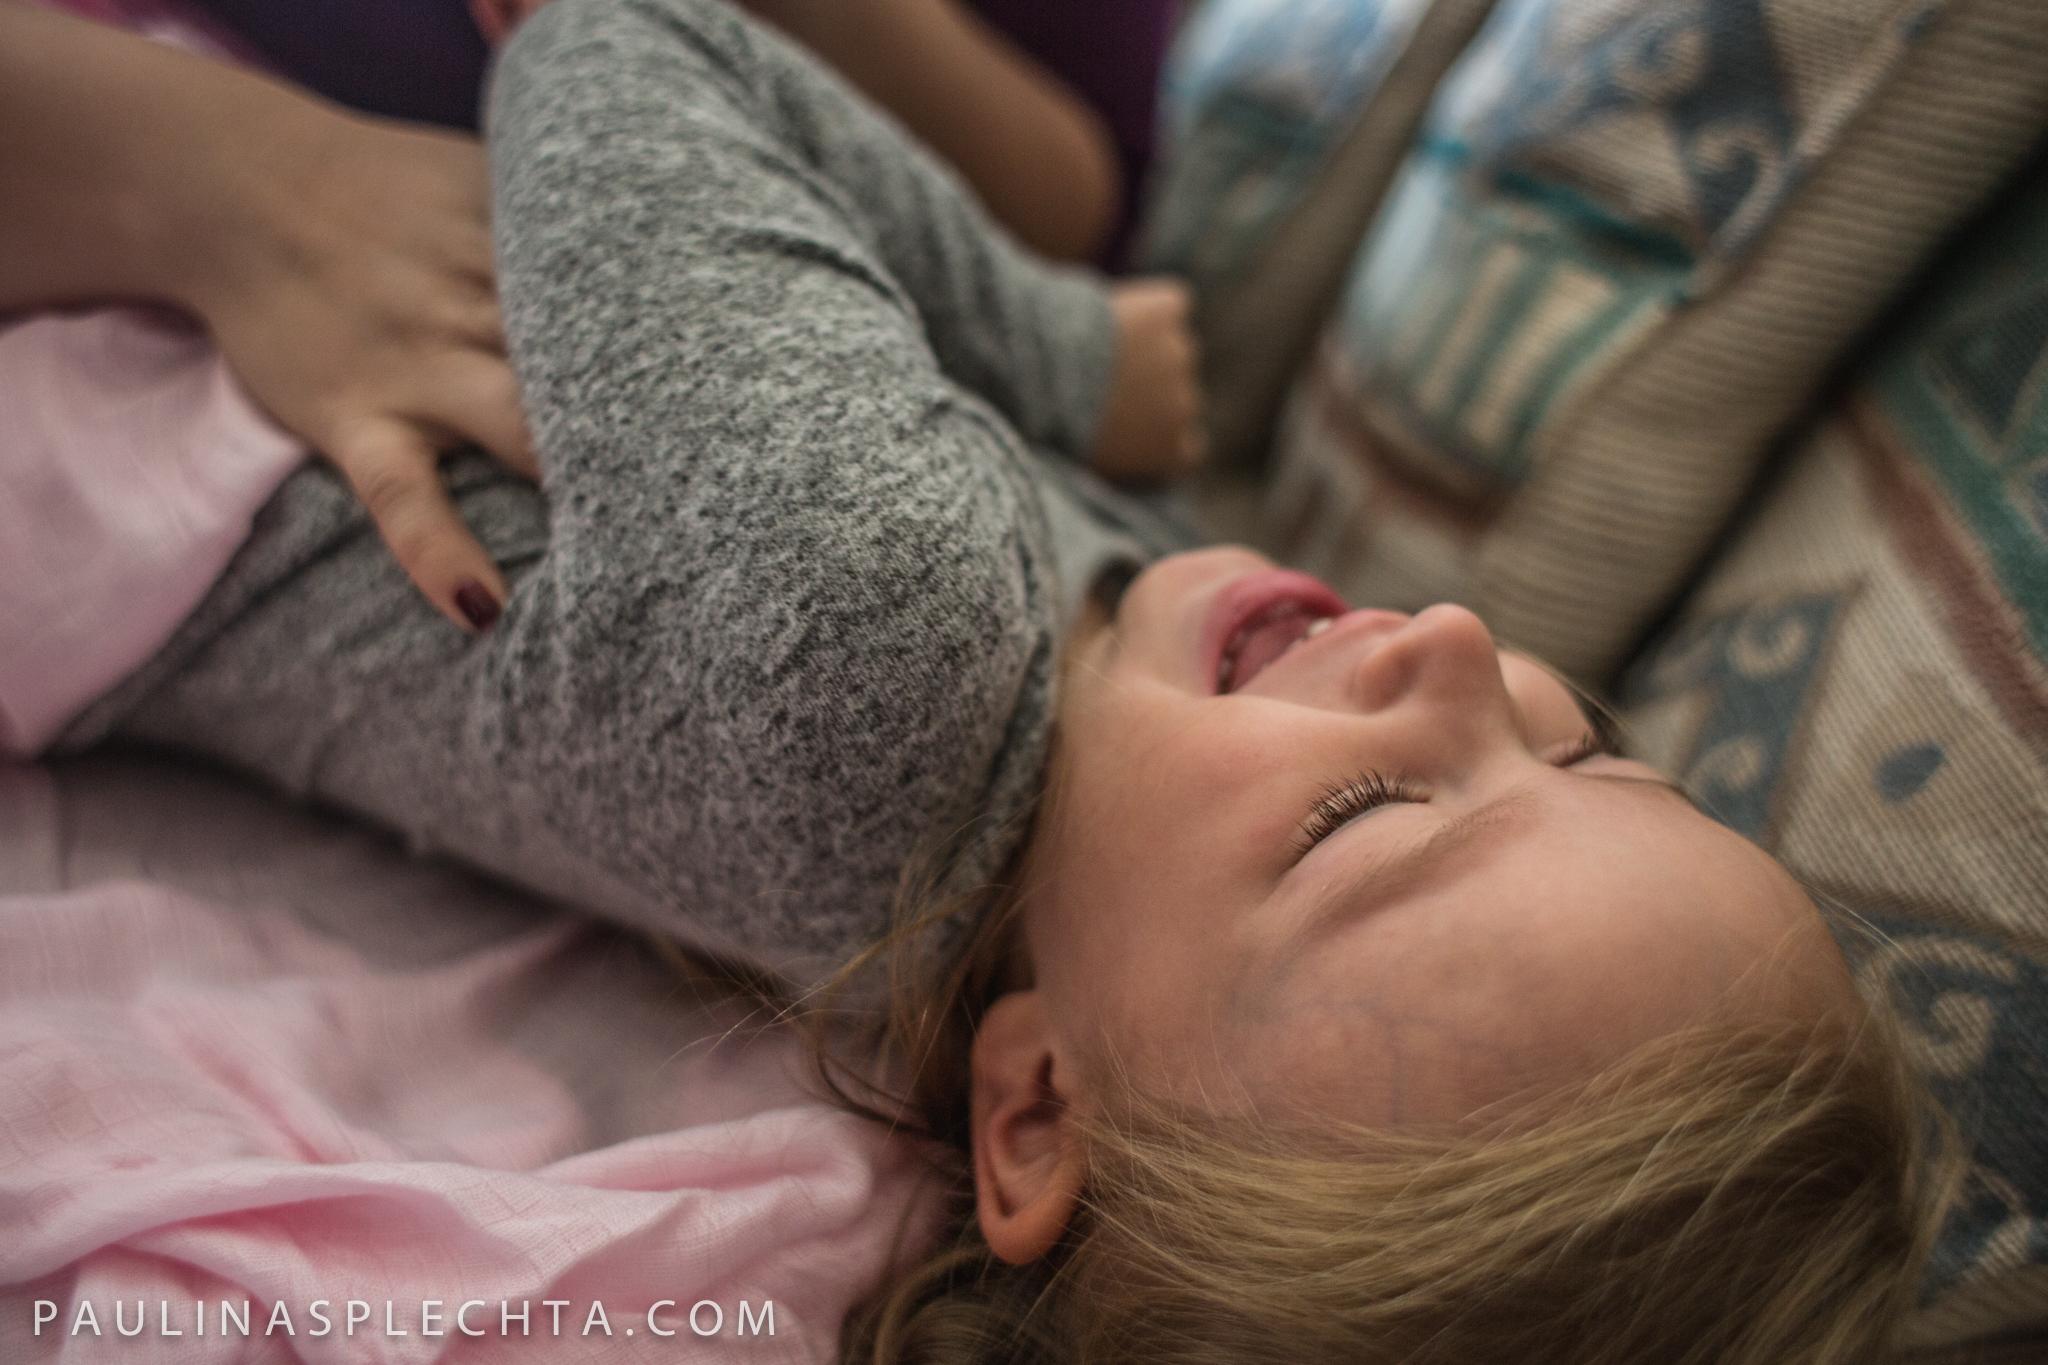 Family Photographer South Florida Pompano Broward Palm Beach Babies Baby Newborn Breastfeeding Birth Photograpy Beach Home Documentary Session-216.jpg